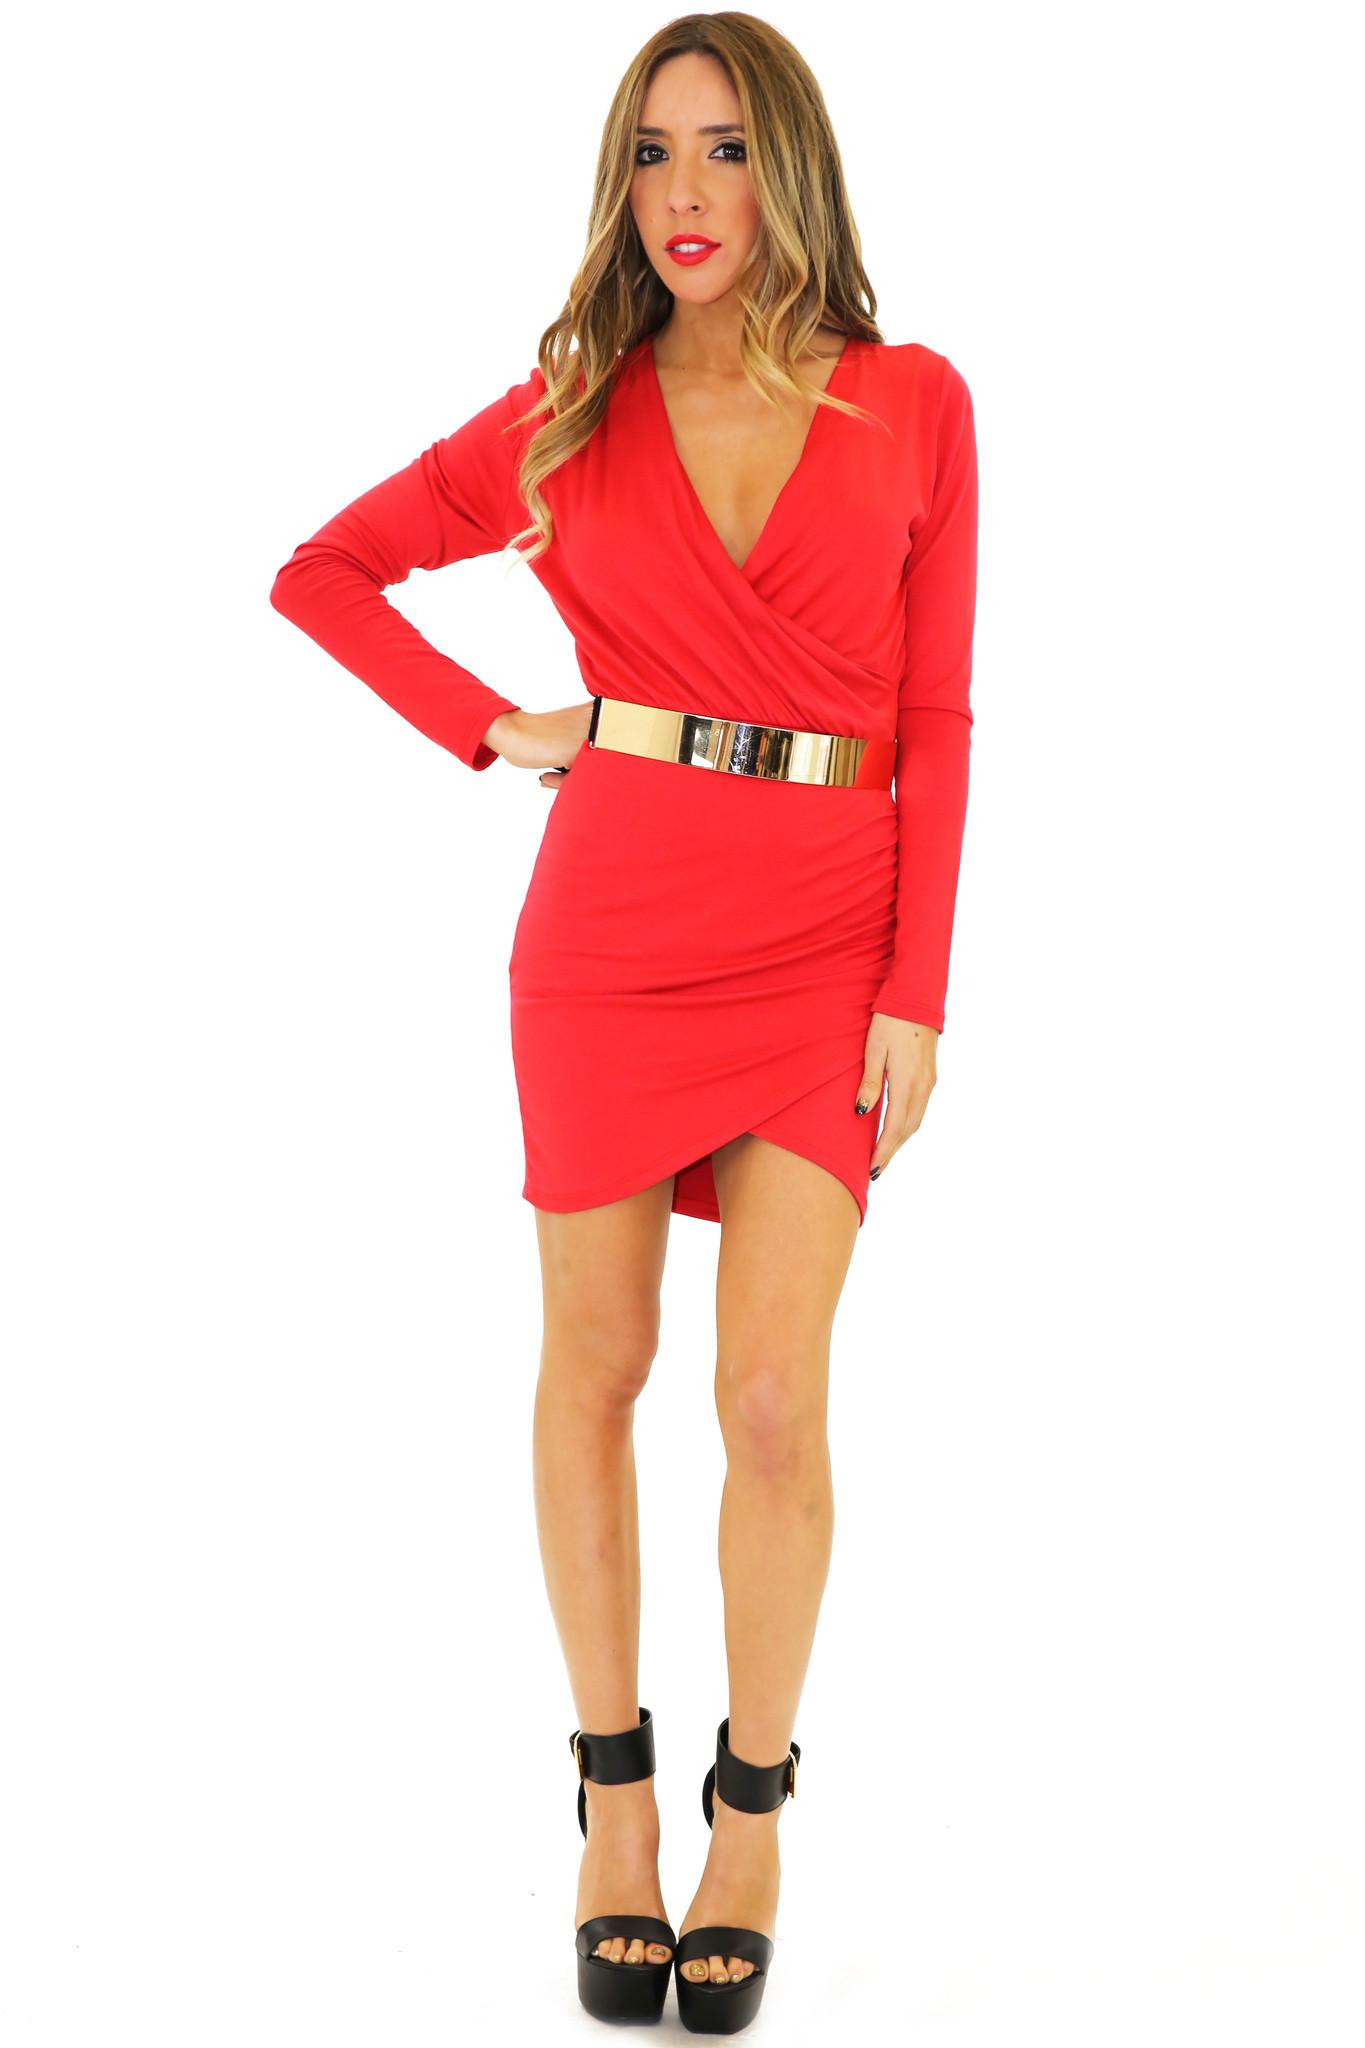 JANE DRAPED DRESS - Red | Haute & Rebellious